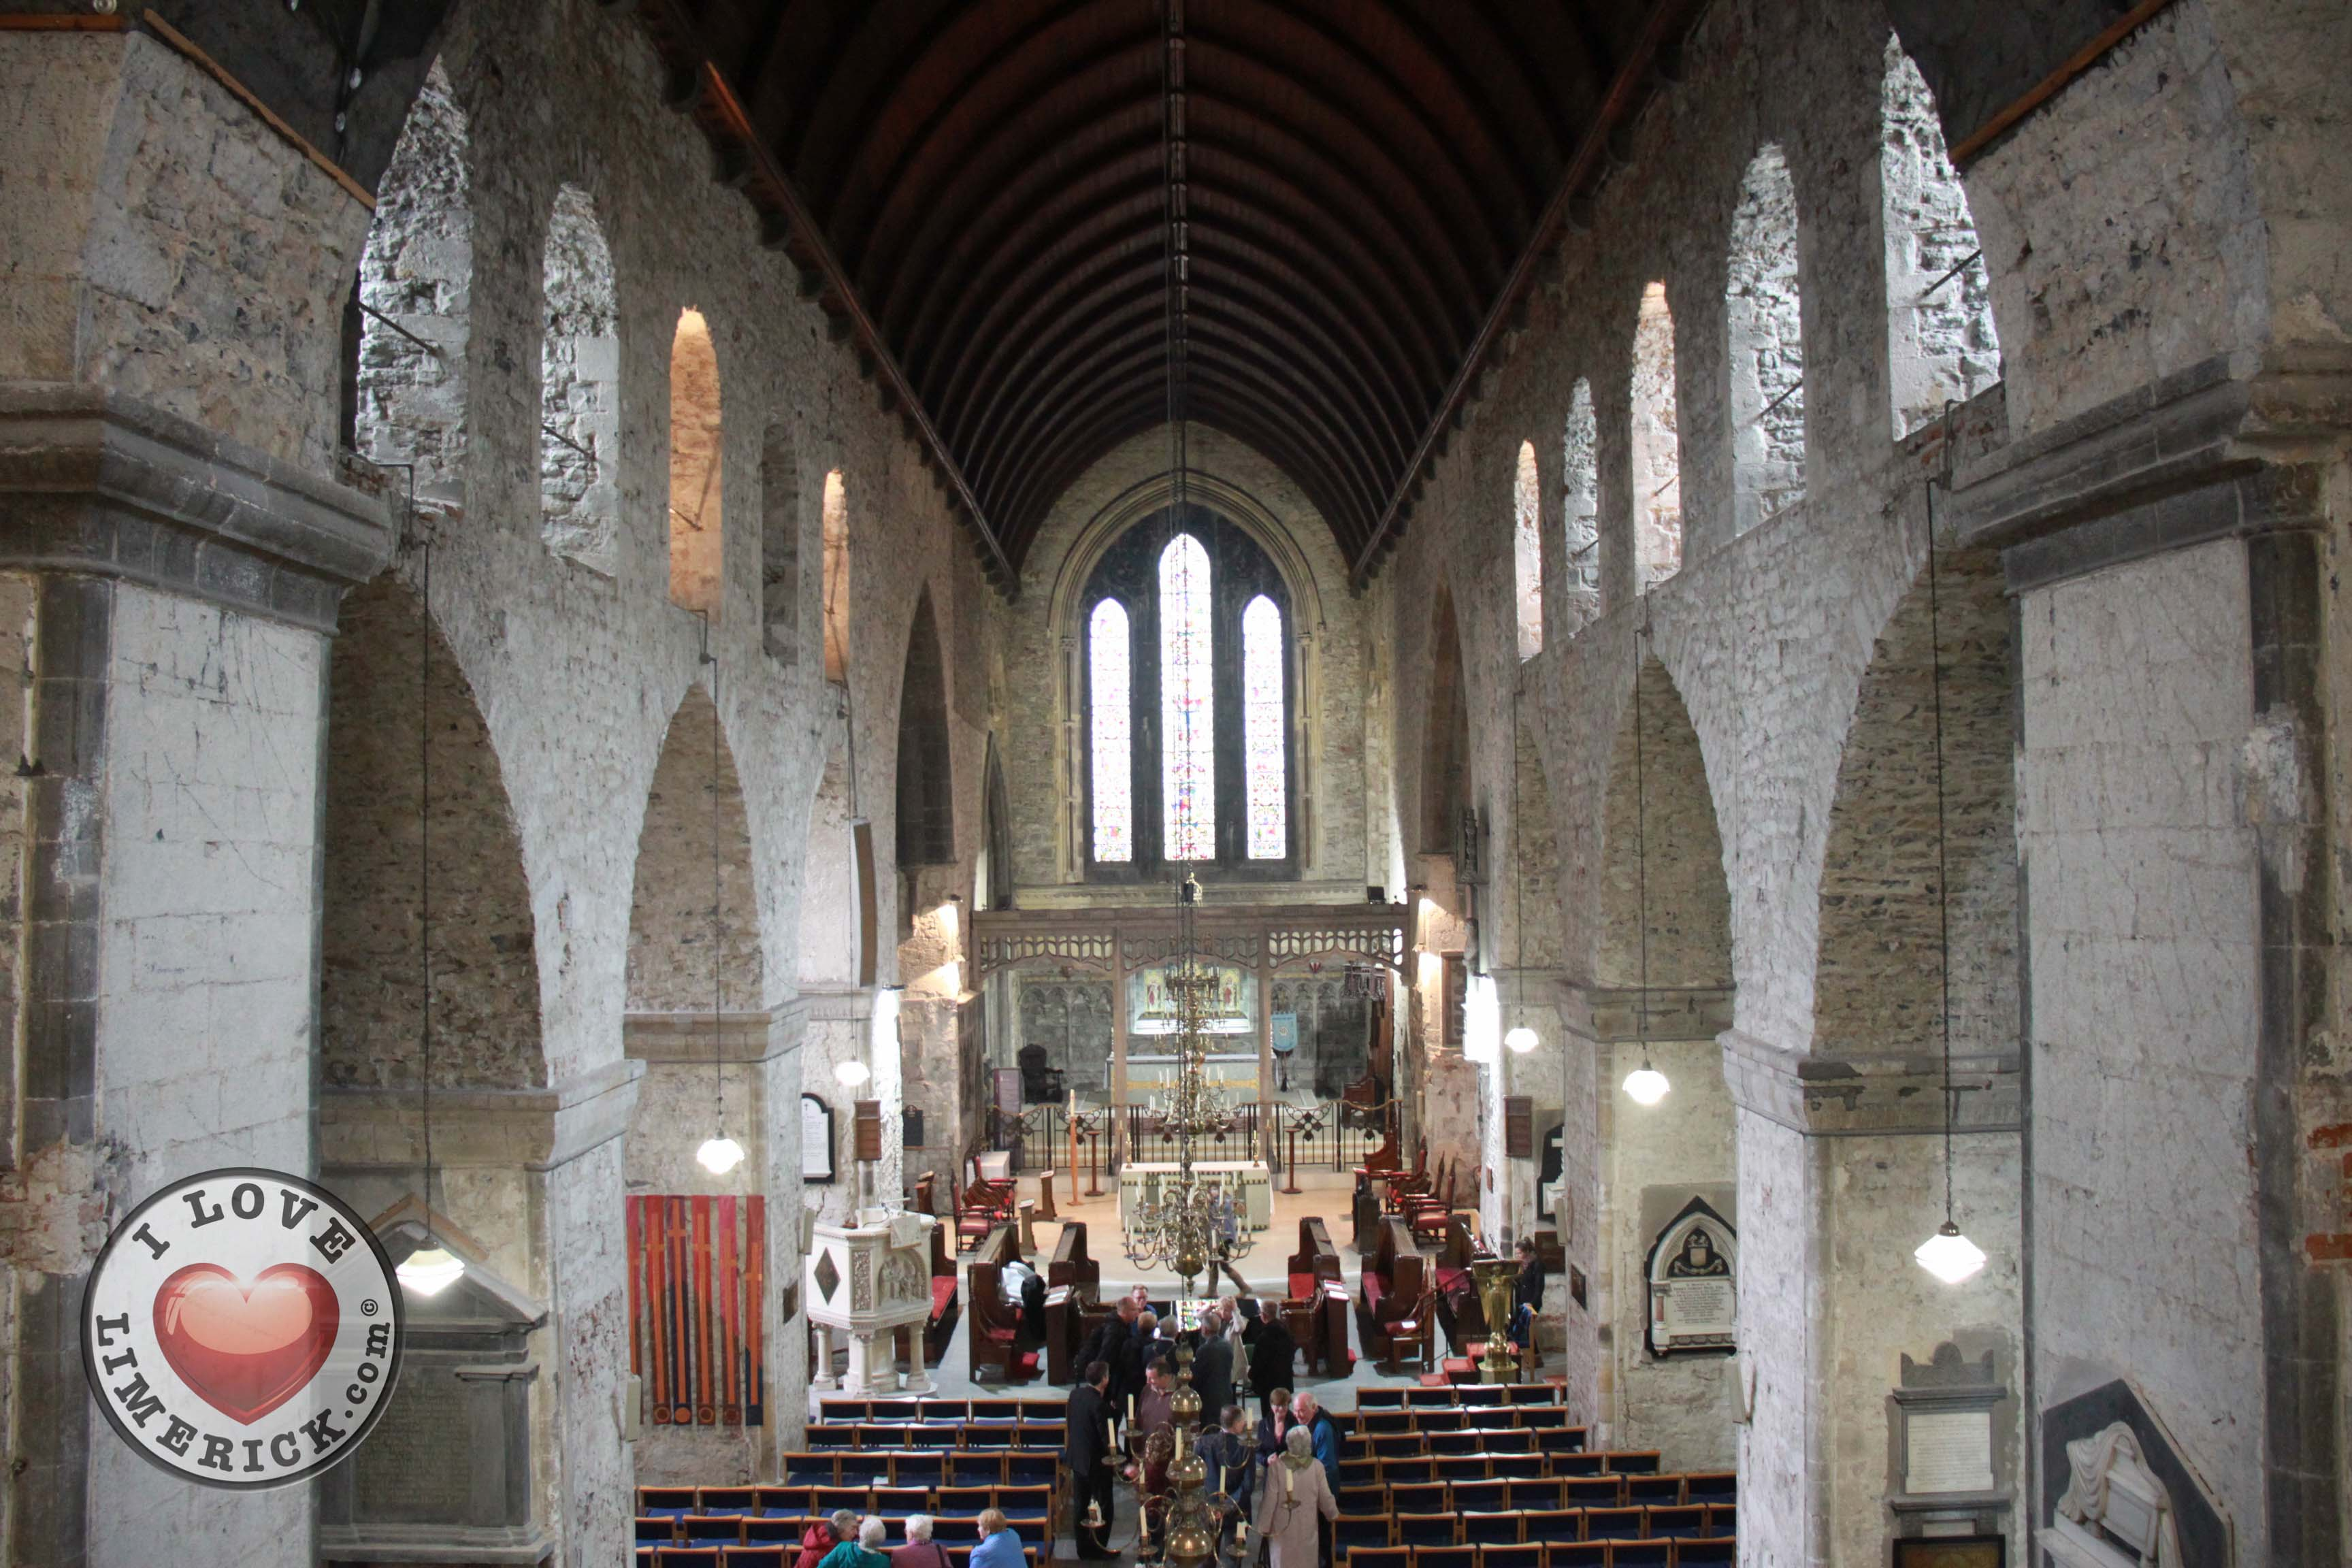 Choir of Kings College Cambridge